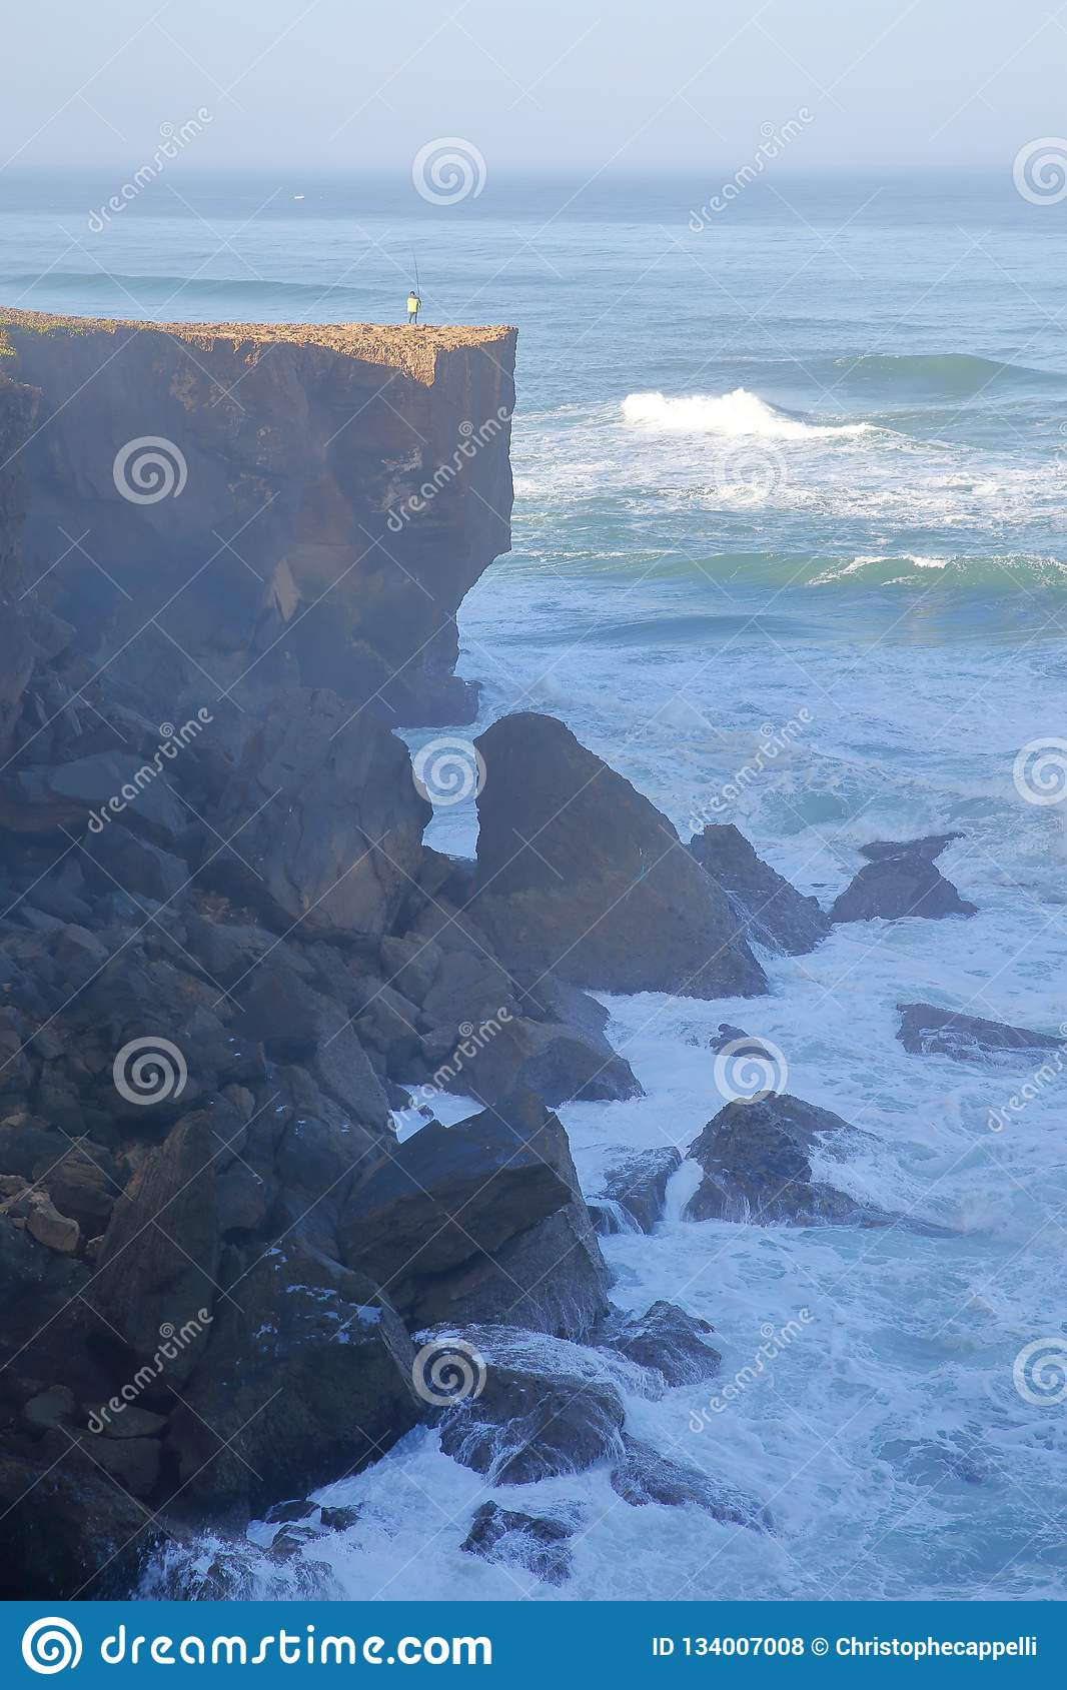 A fisherman angling above the high cliffs near Amoreira beach Aljezur, Costa Vicentina, Algarve